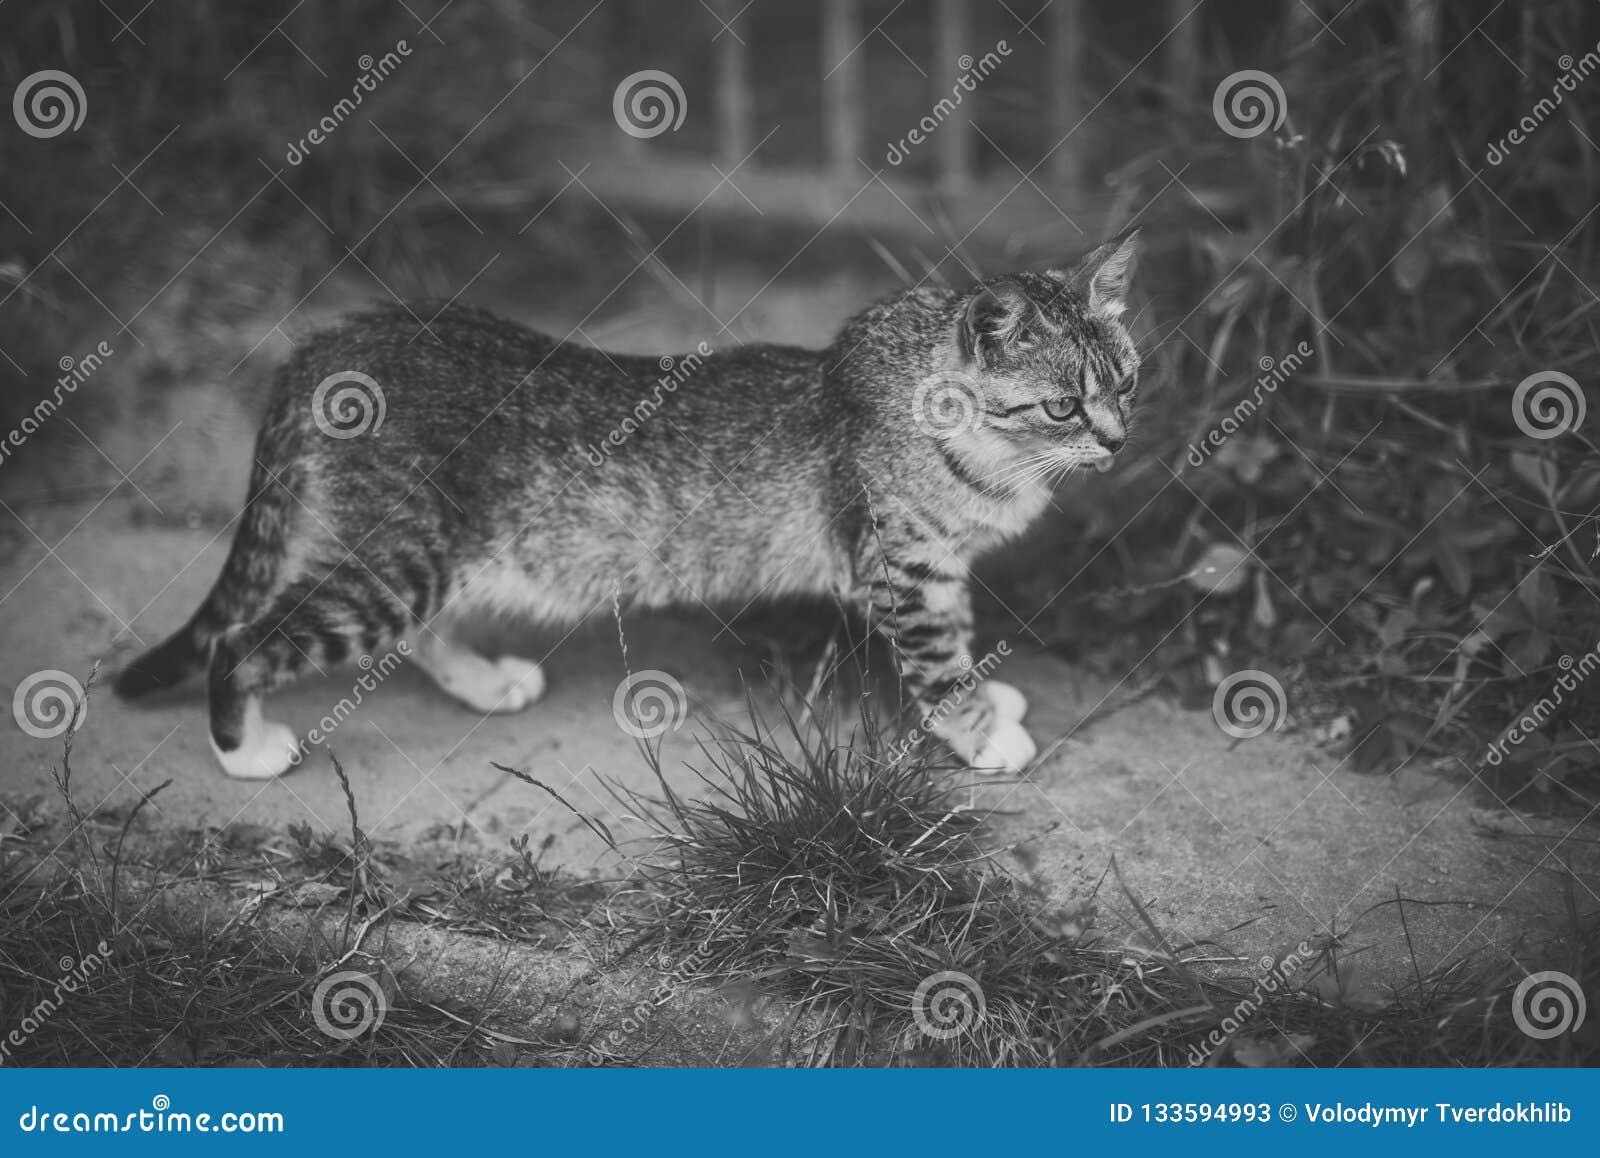 Animal felino, doméstico, mamífero